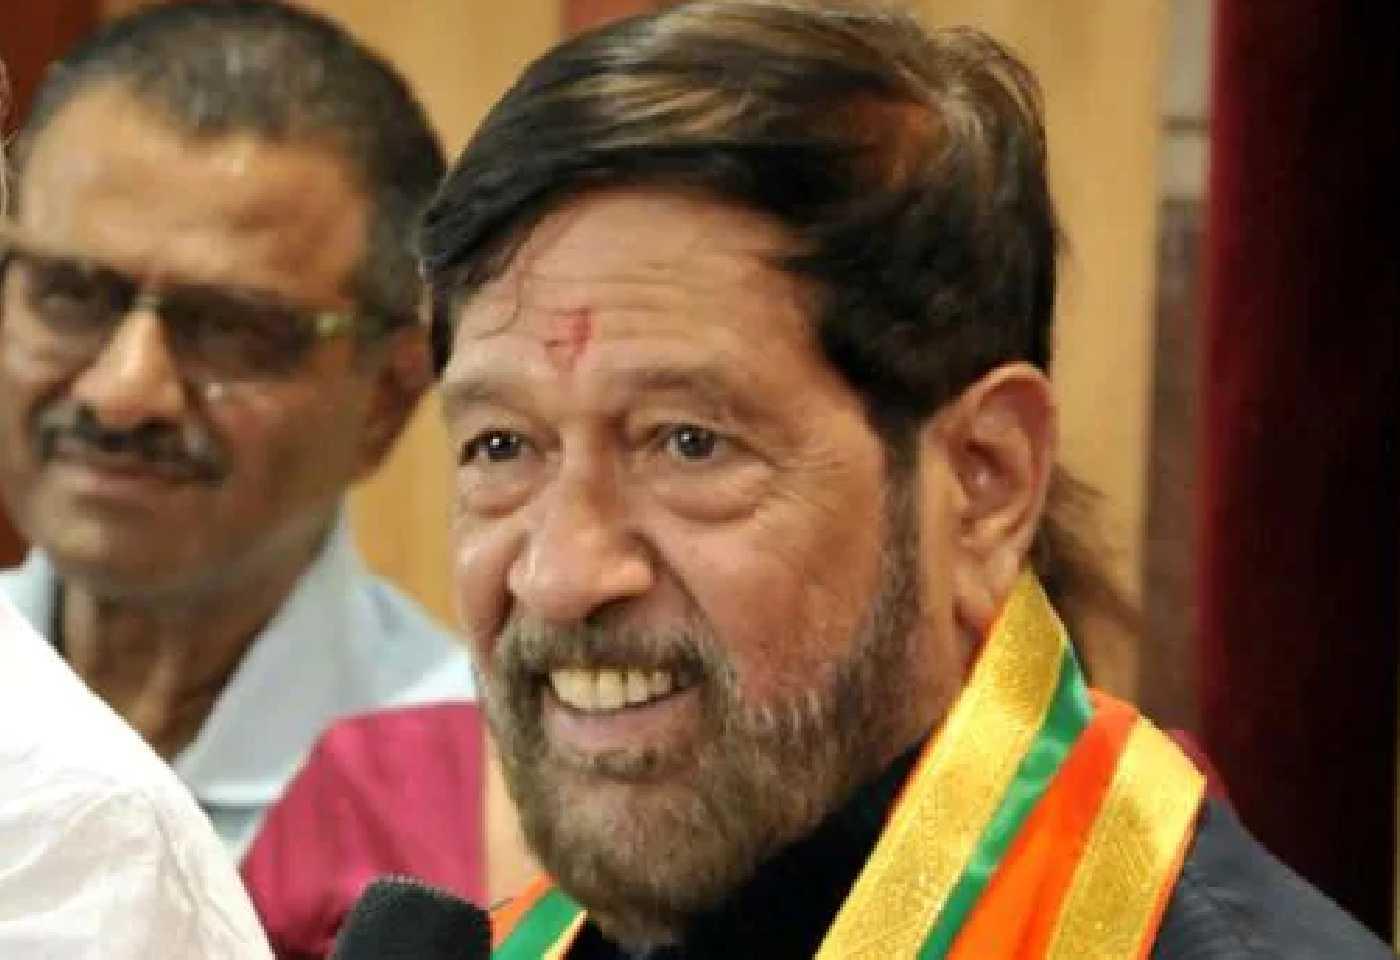 BJP MP Girish Bapat says shiv sena BJP Alliance will be on Hindutwa